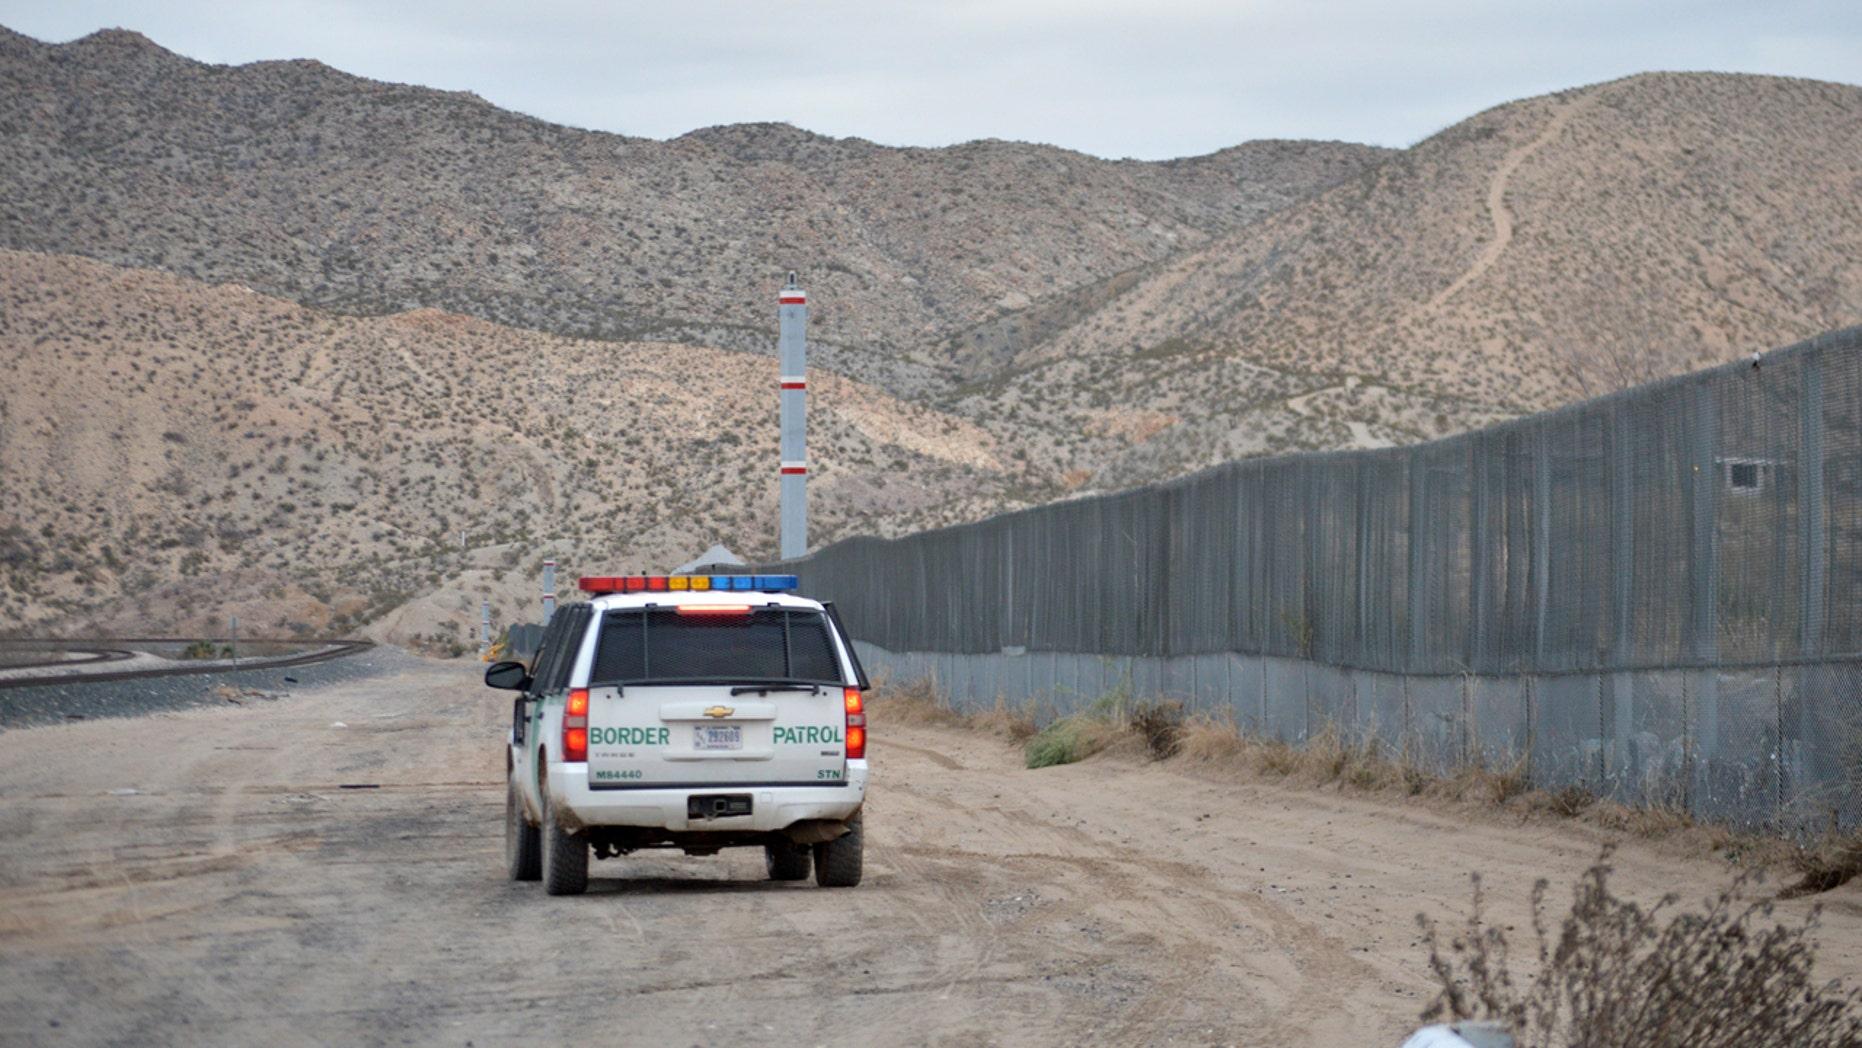 Jan. 4, 2016: , A U.S. Border Patrol agent drives near the U.S.-Mexico border fence in Sunland Park, N.M.